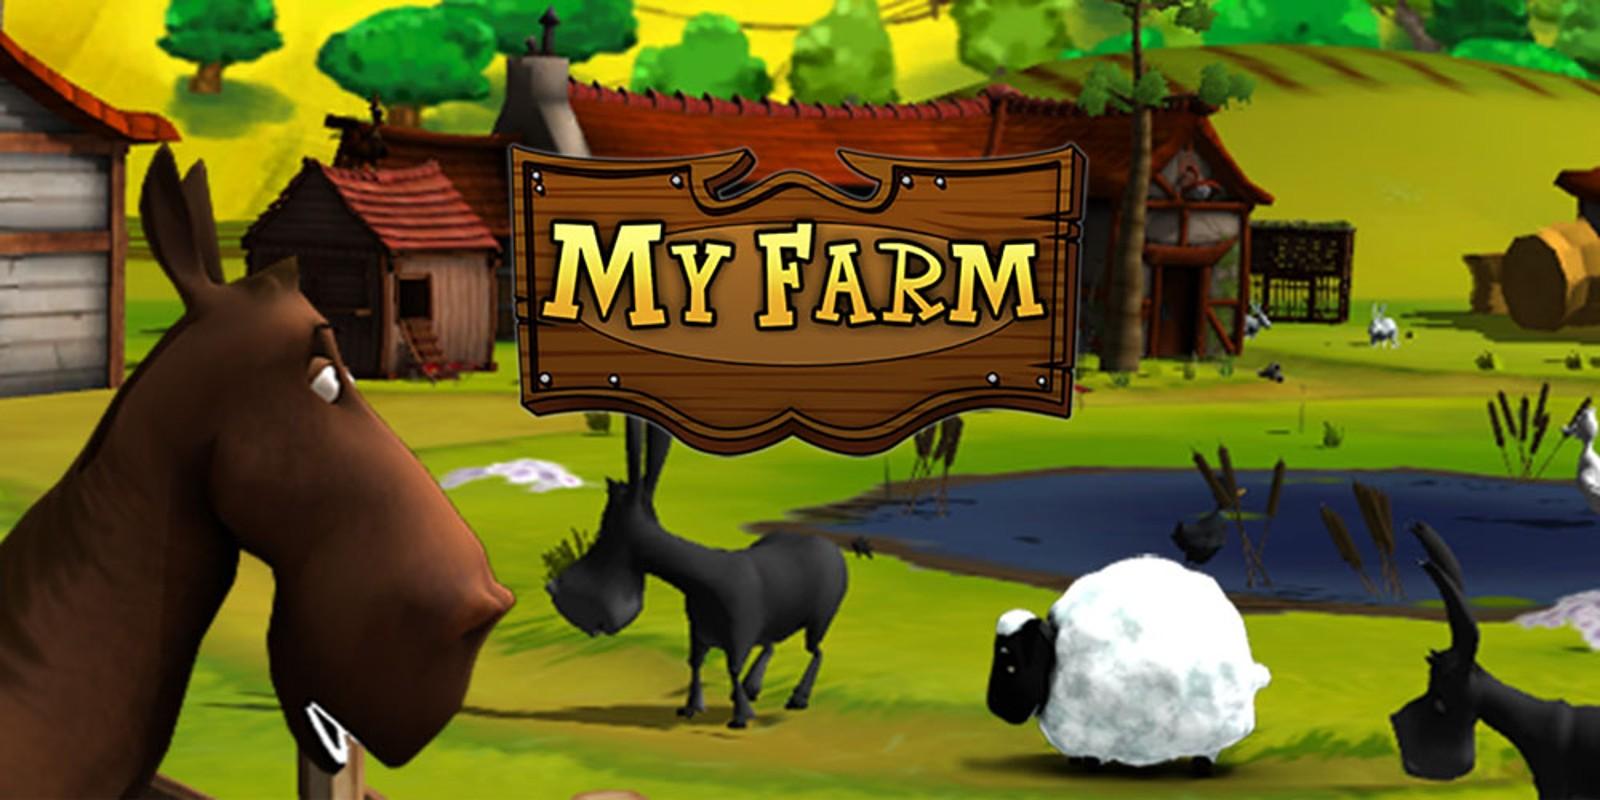 My Farm | Wii U download software | Games | Nintendo